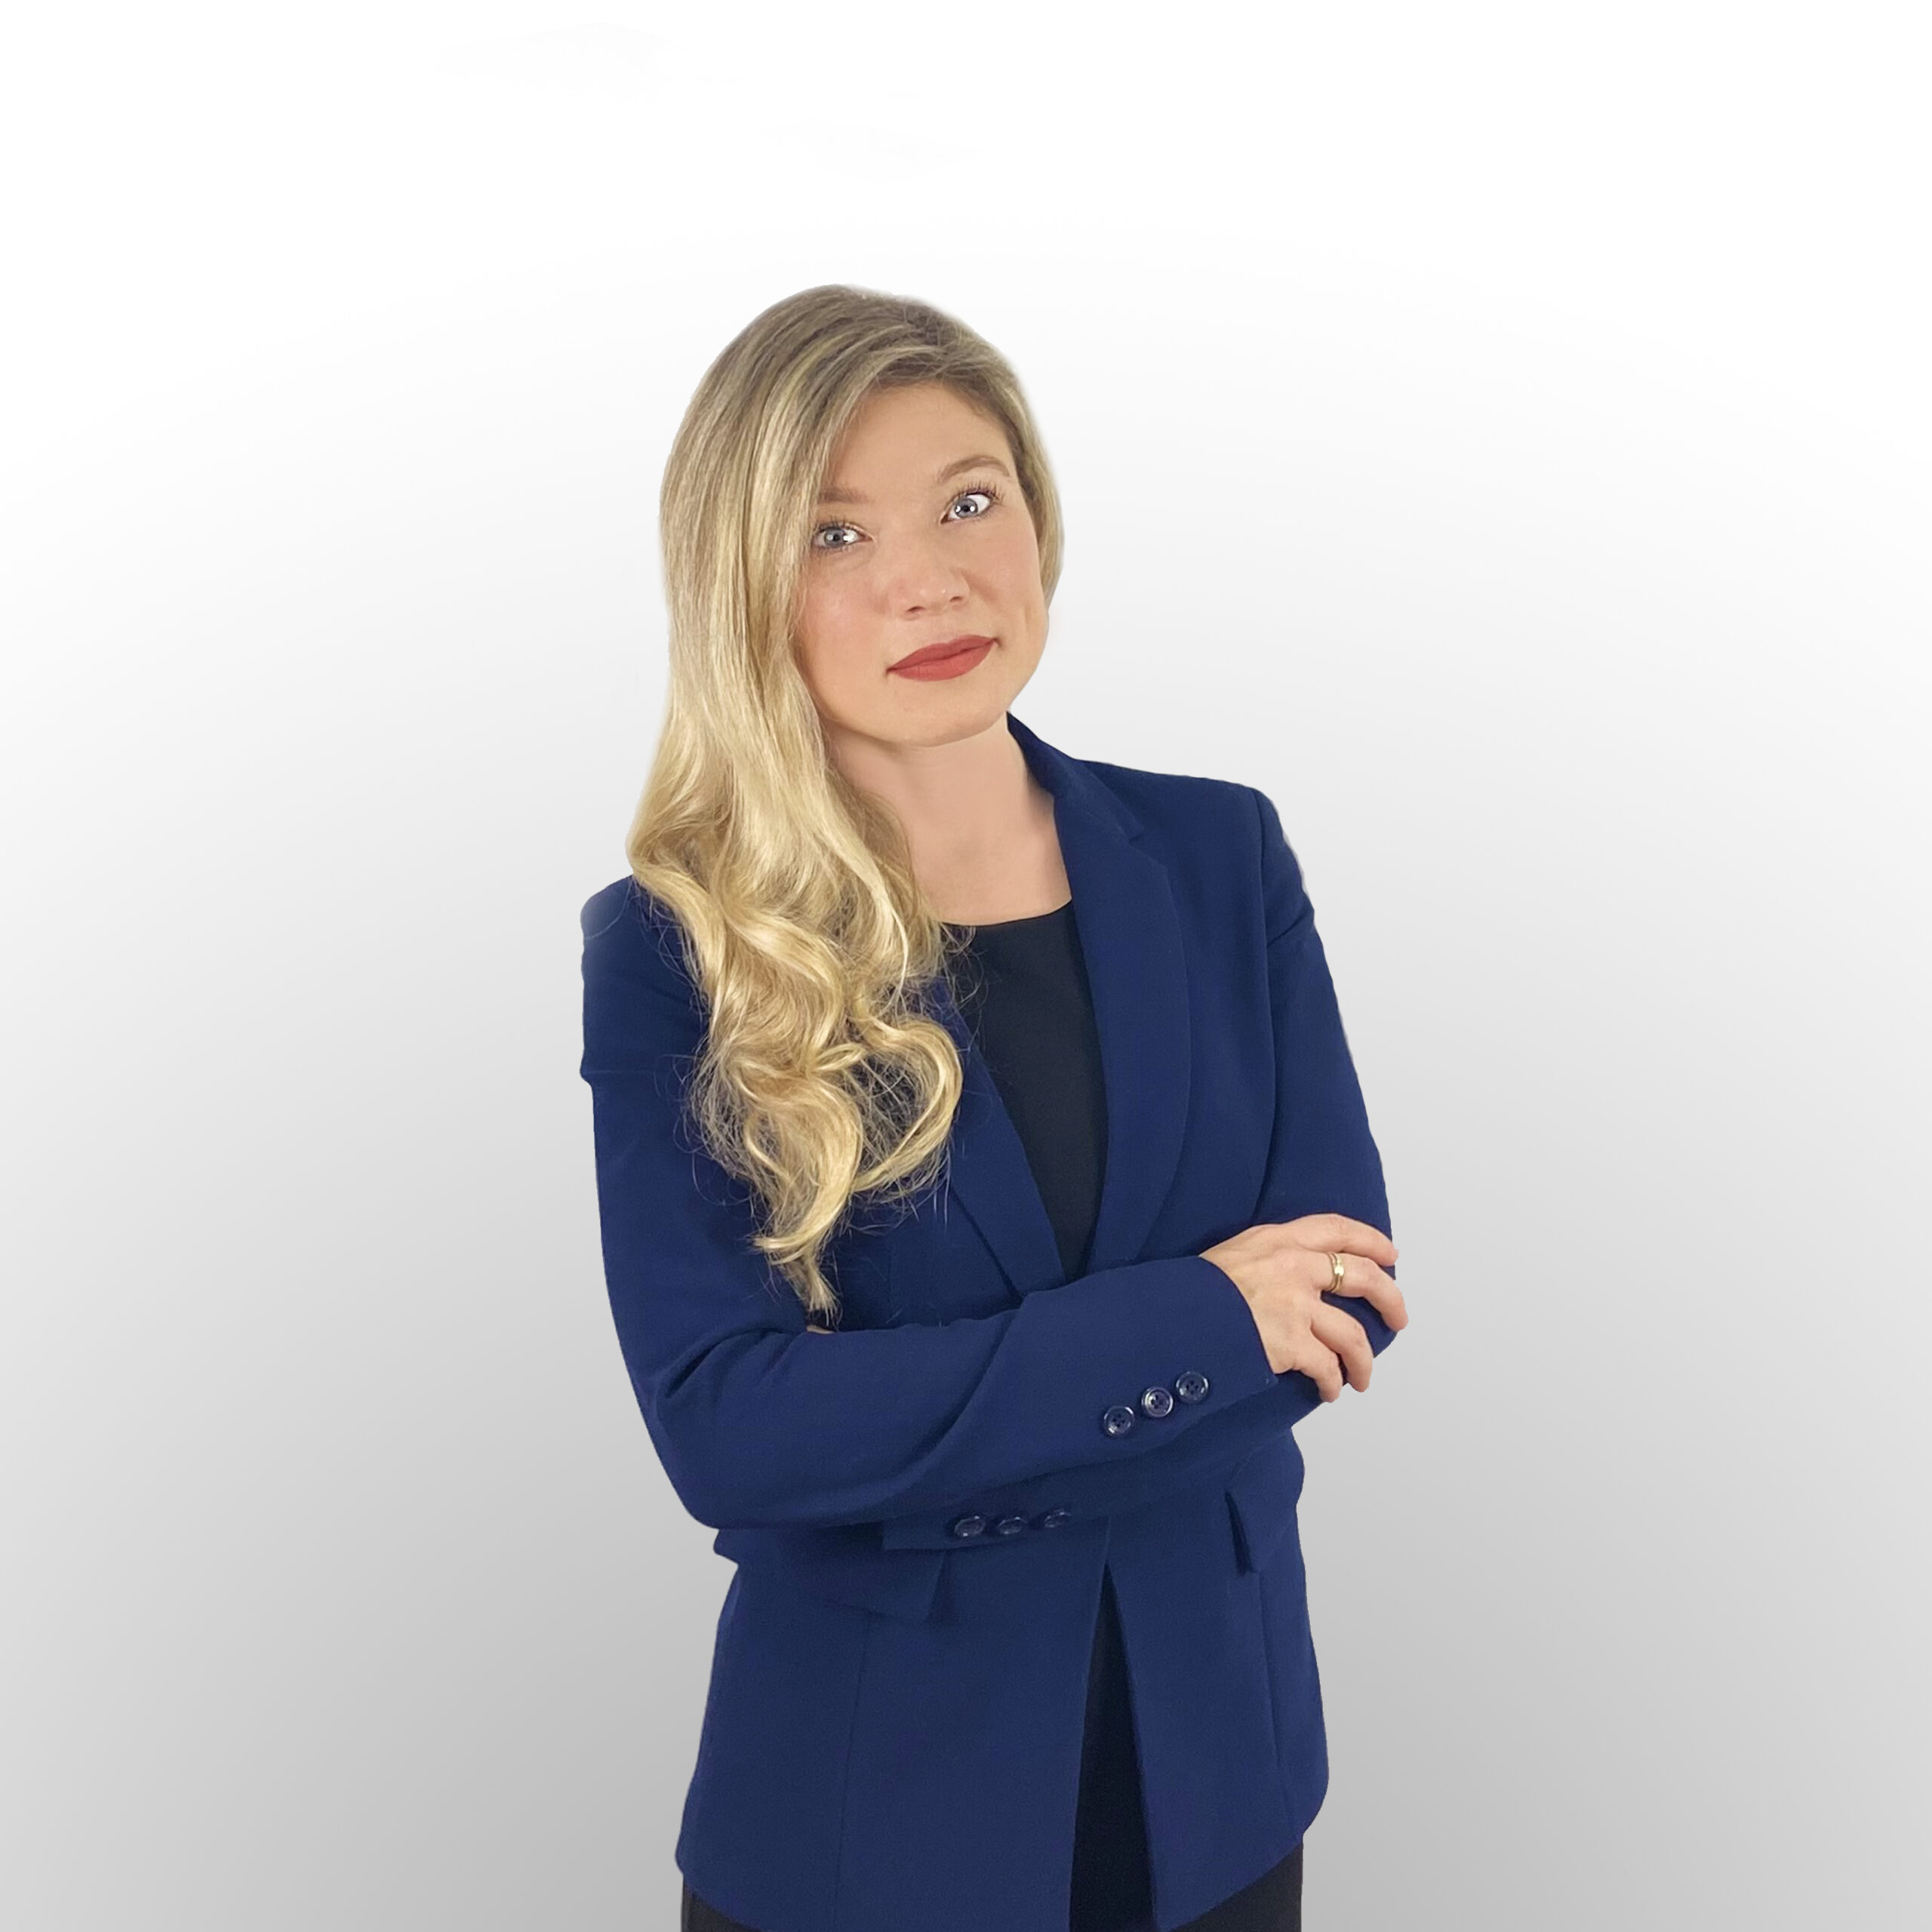 Polina Pertseva